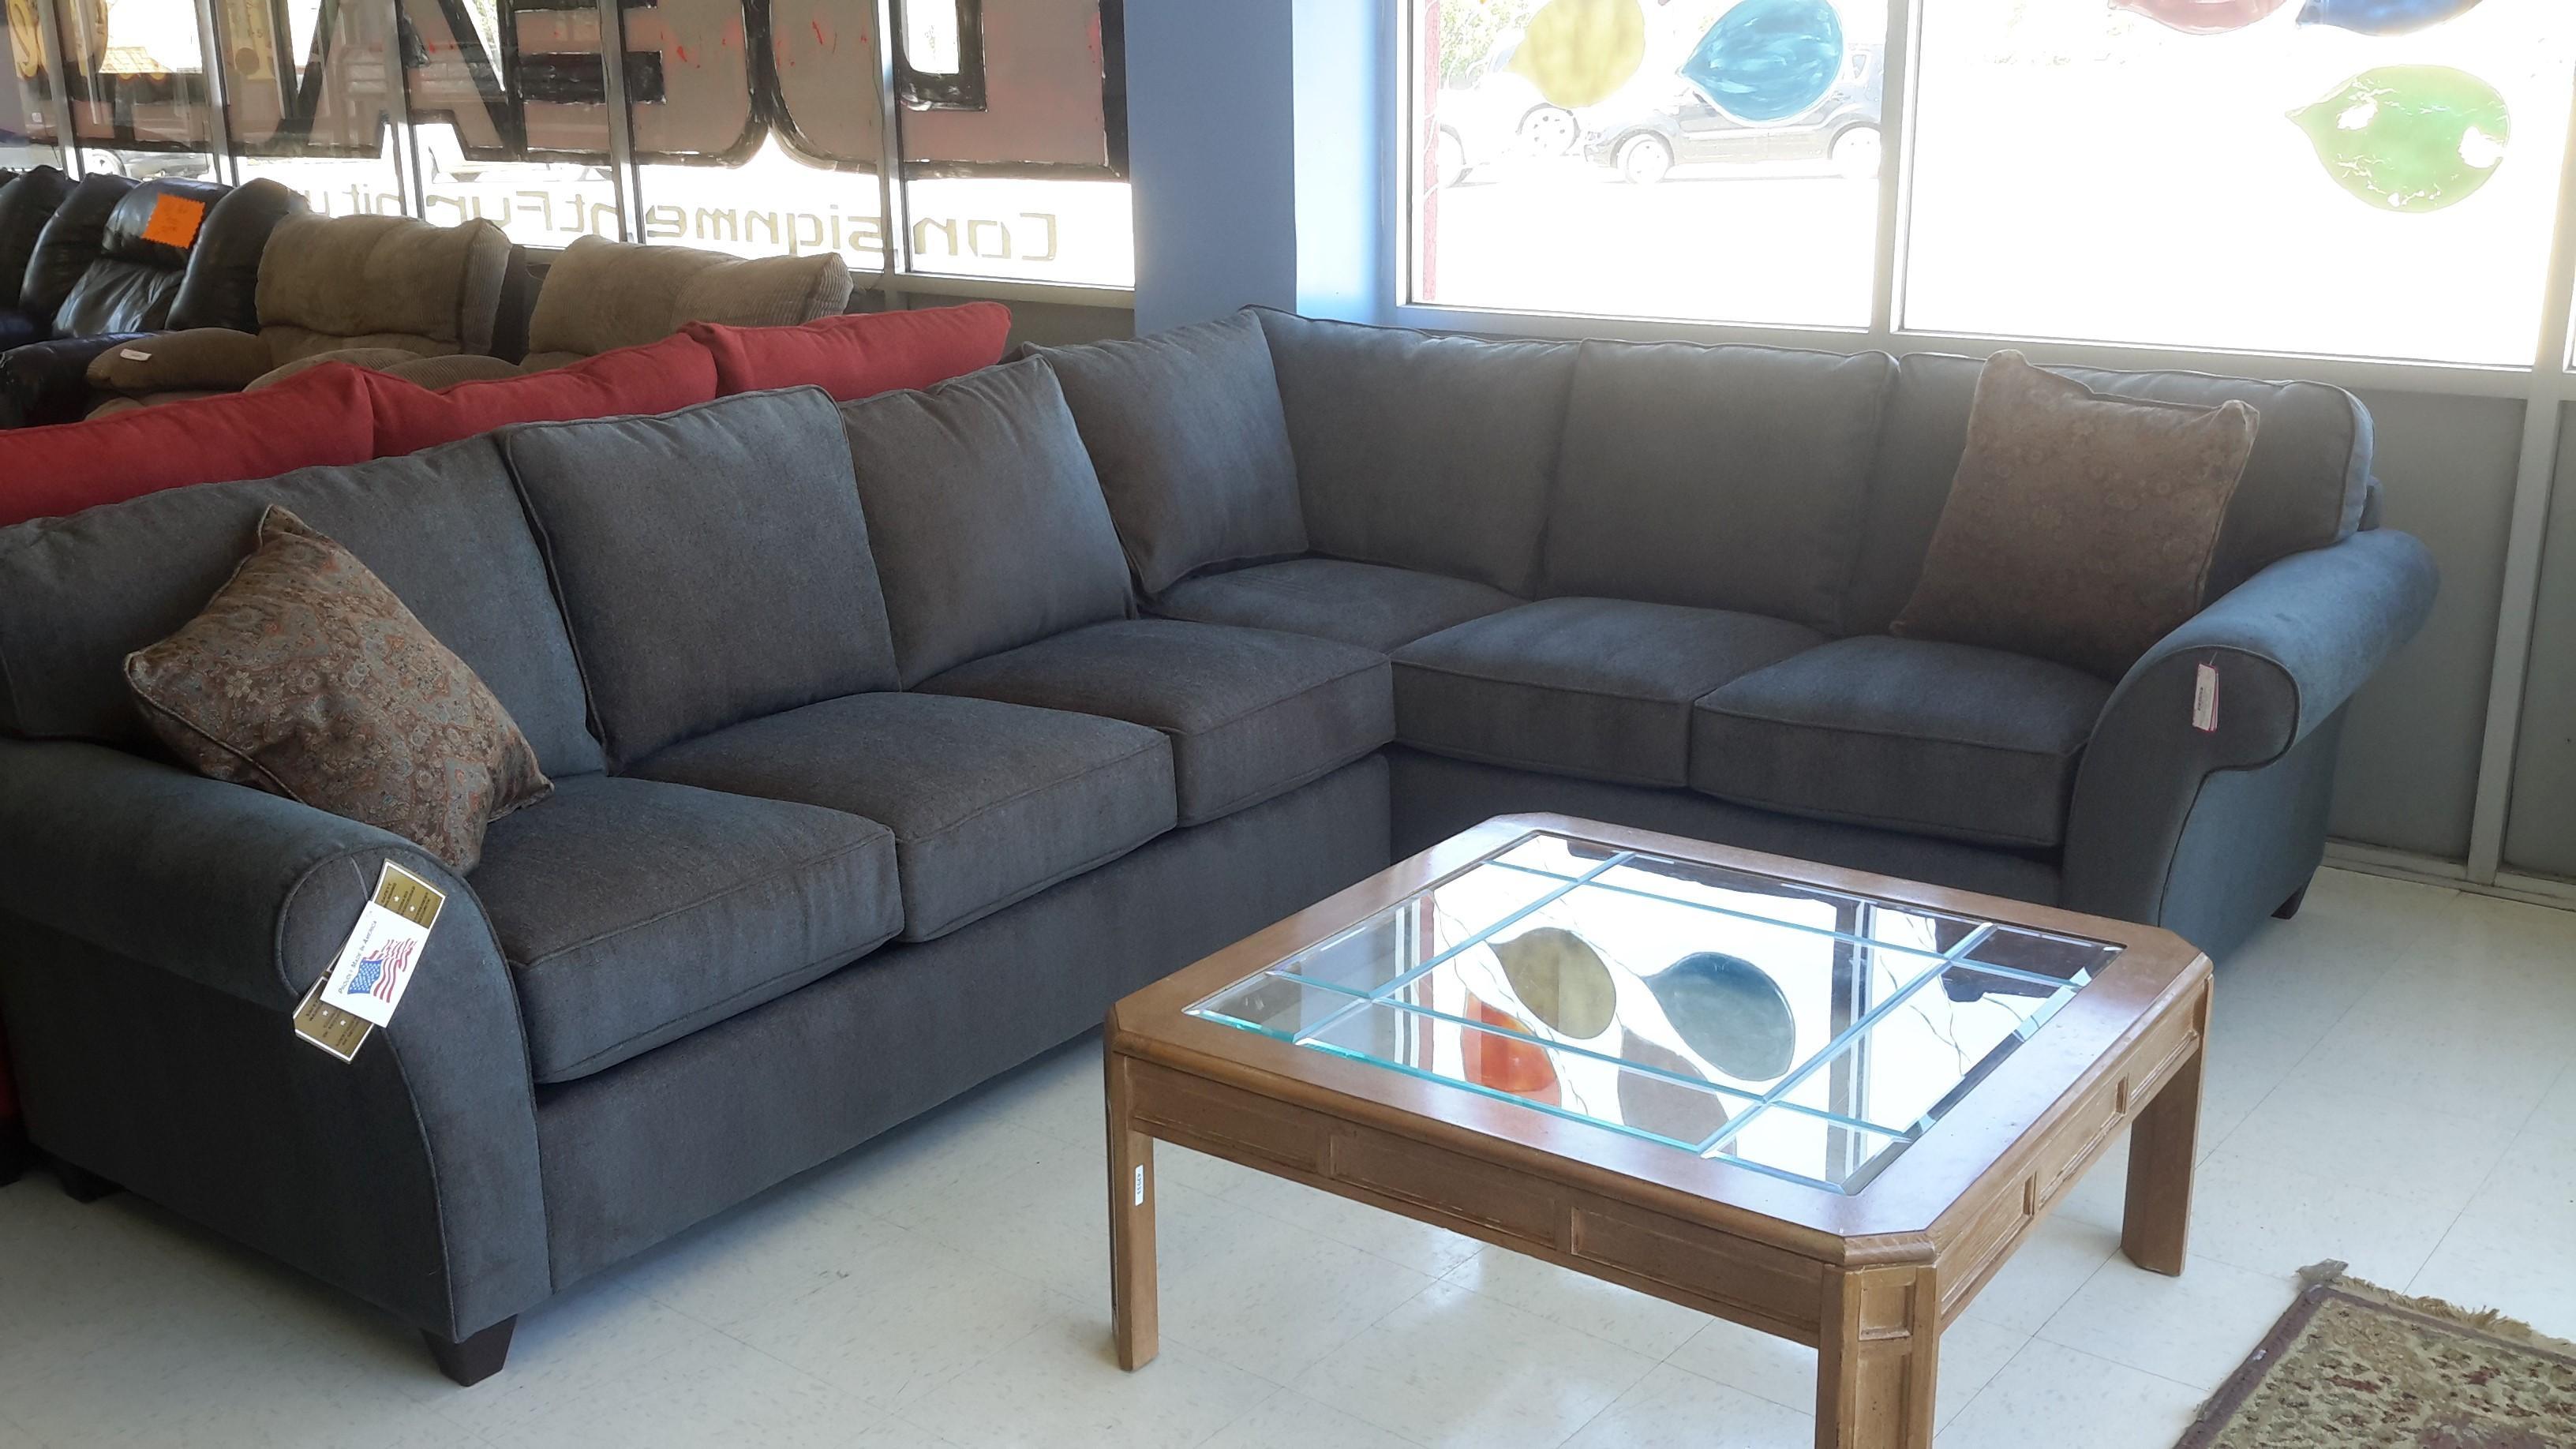 Bauhaus Furniture Sofa With Design Gallery 25091 | Kengire Within Bauhaus Furniture Sectional Sofas (Image 4 of 20)